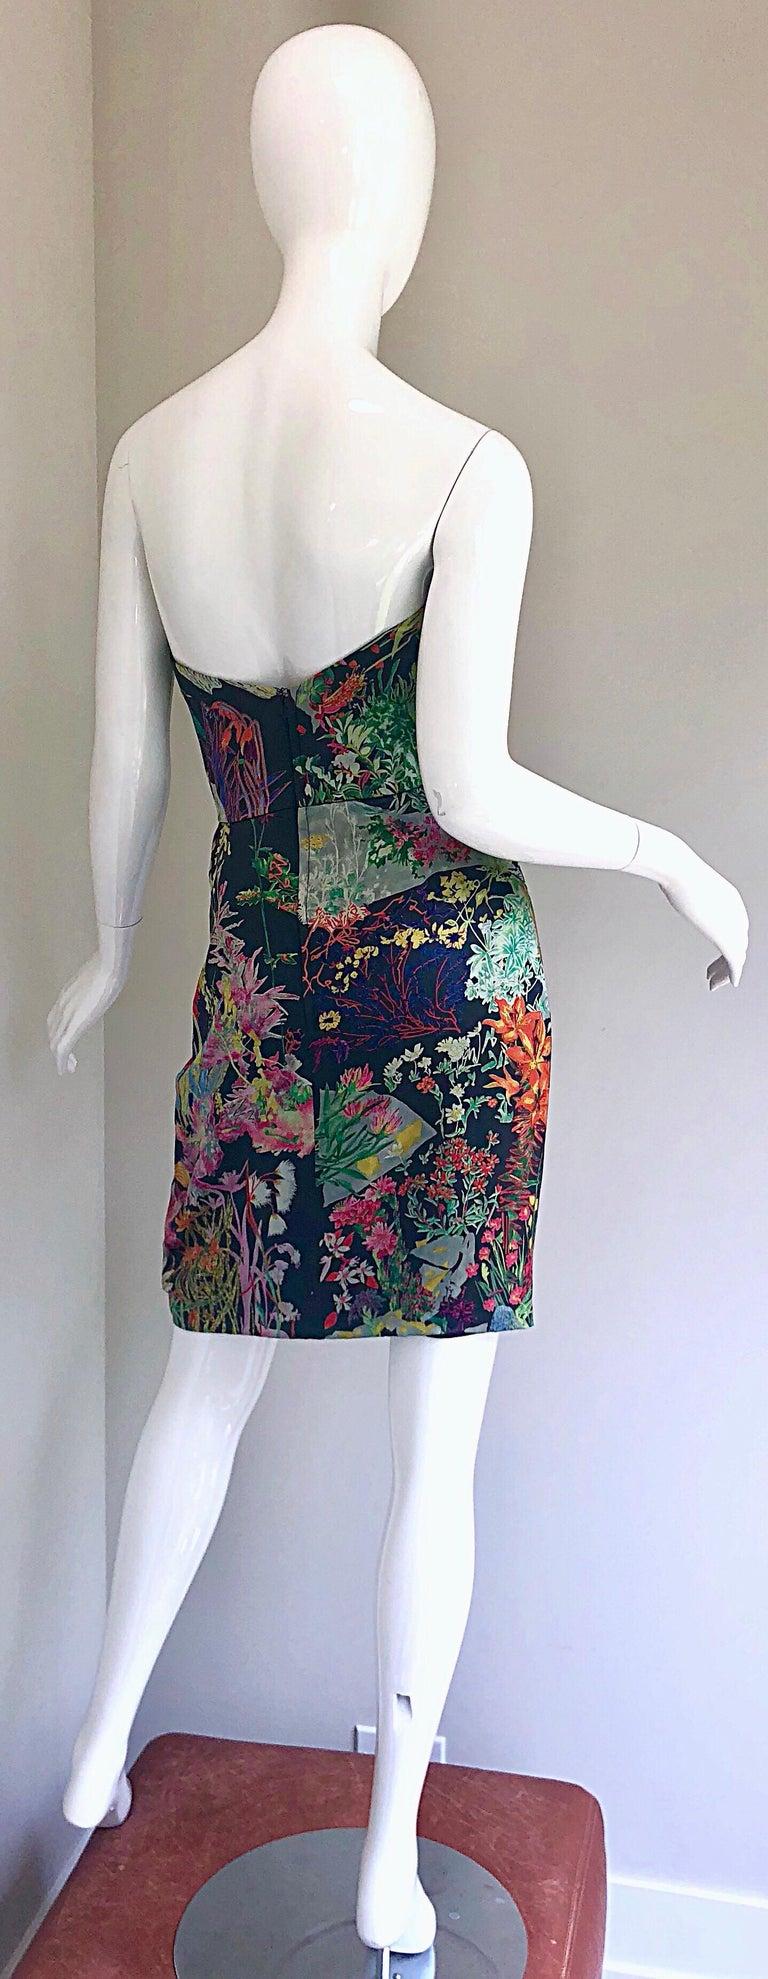 Vintage Vicky Tiel Couture Botanical Print 80s Size 6 / 8 Silk Strapless Dress For Sale 3